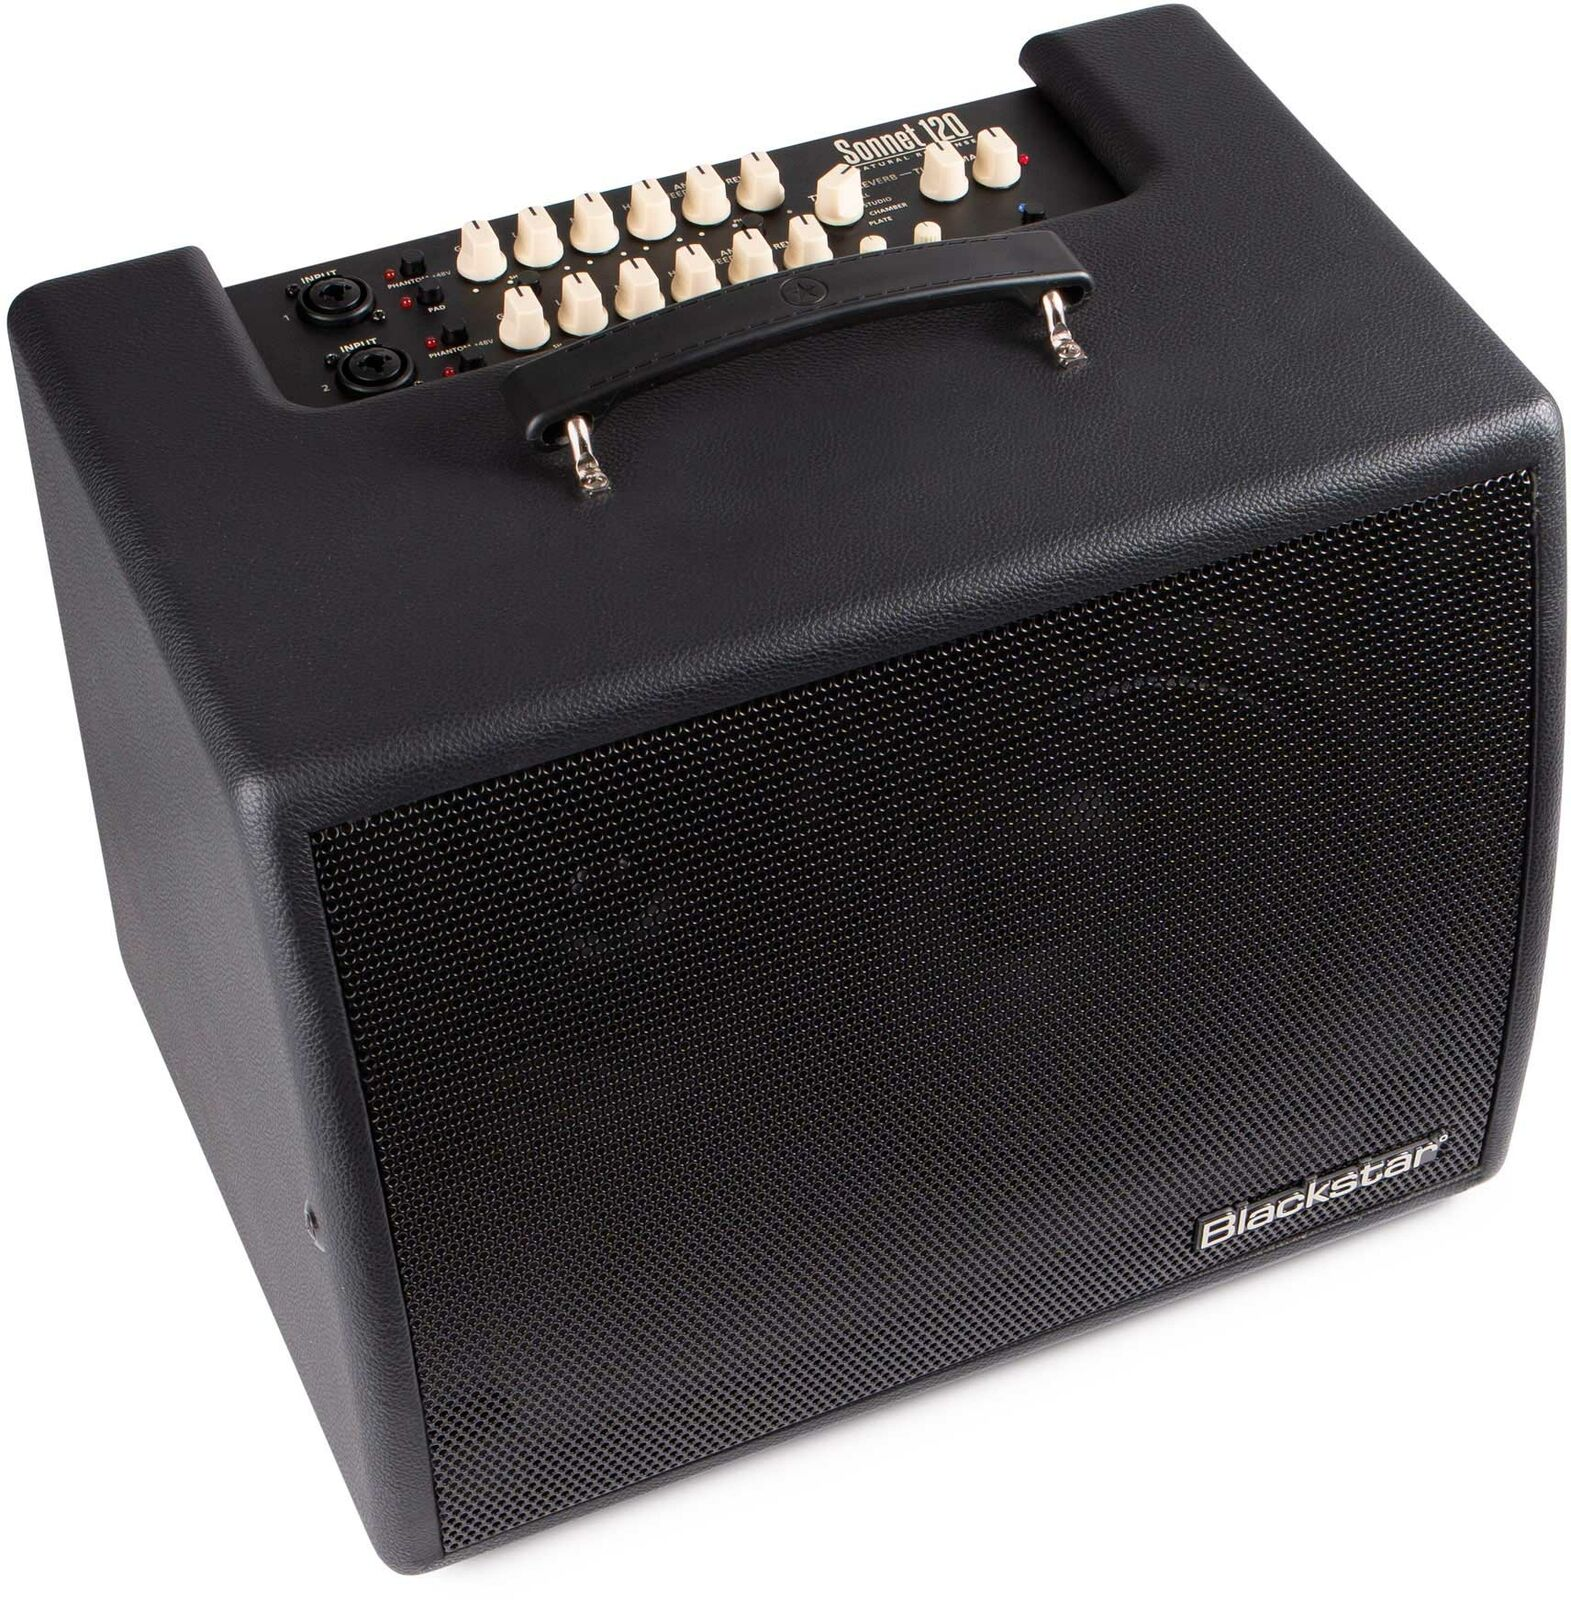 BLACKSTAR SONNET 120 BLACK AMPLIFICATORI PER CHITARRA ACUSTICA